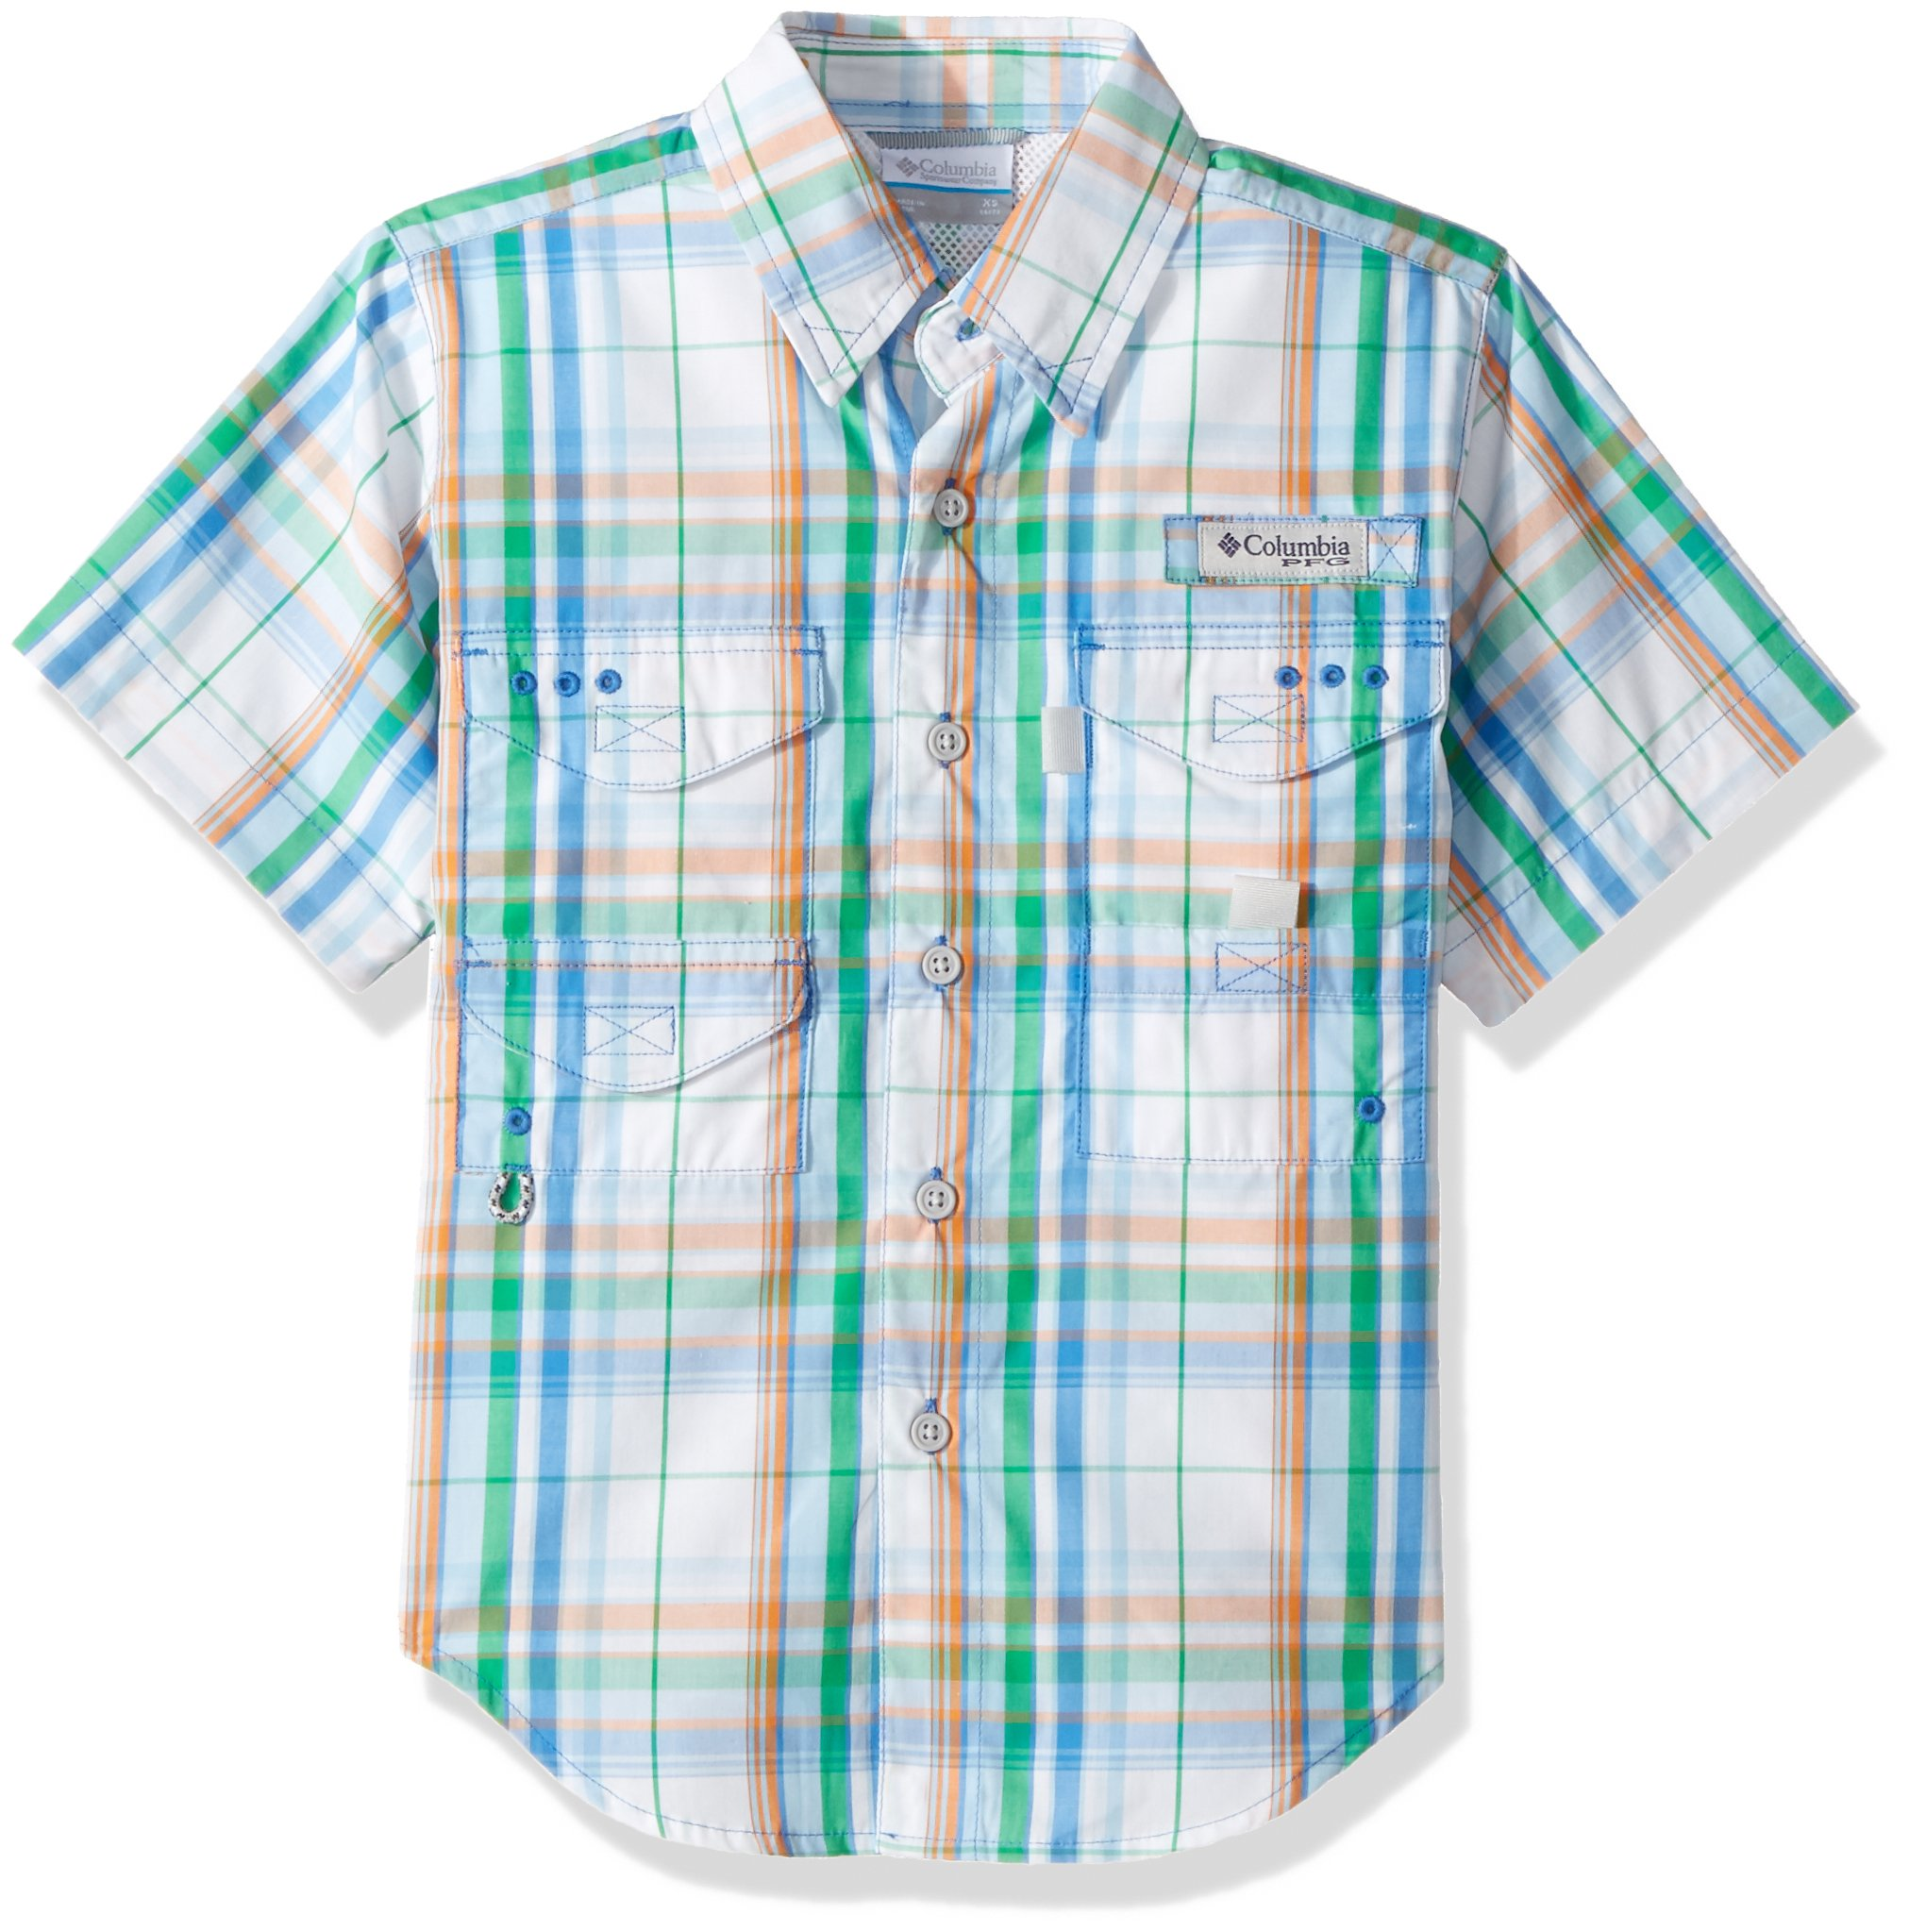 Columbia Youth Boys Super Bonehead Short Sleeve Shirt, Harbor Blue Plaid, Small